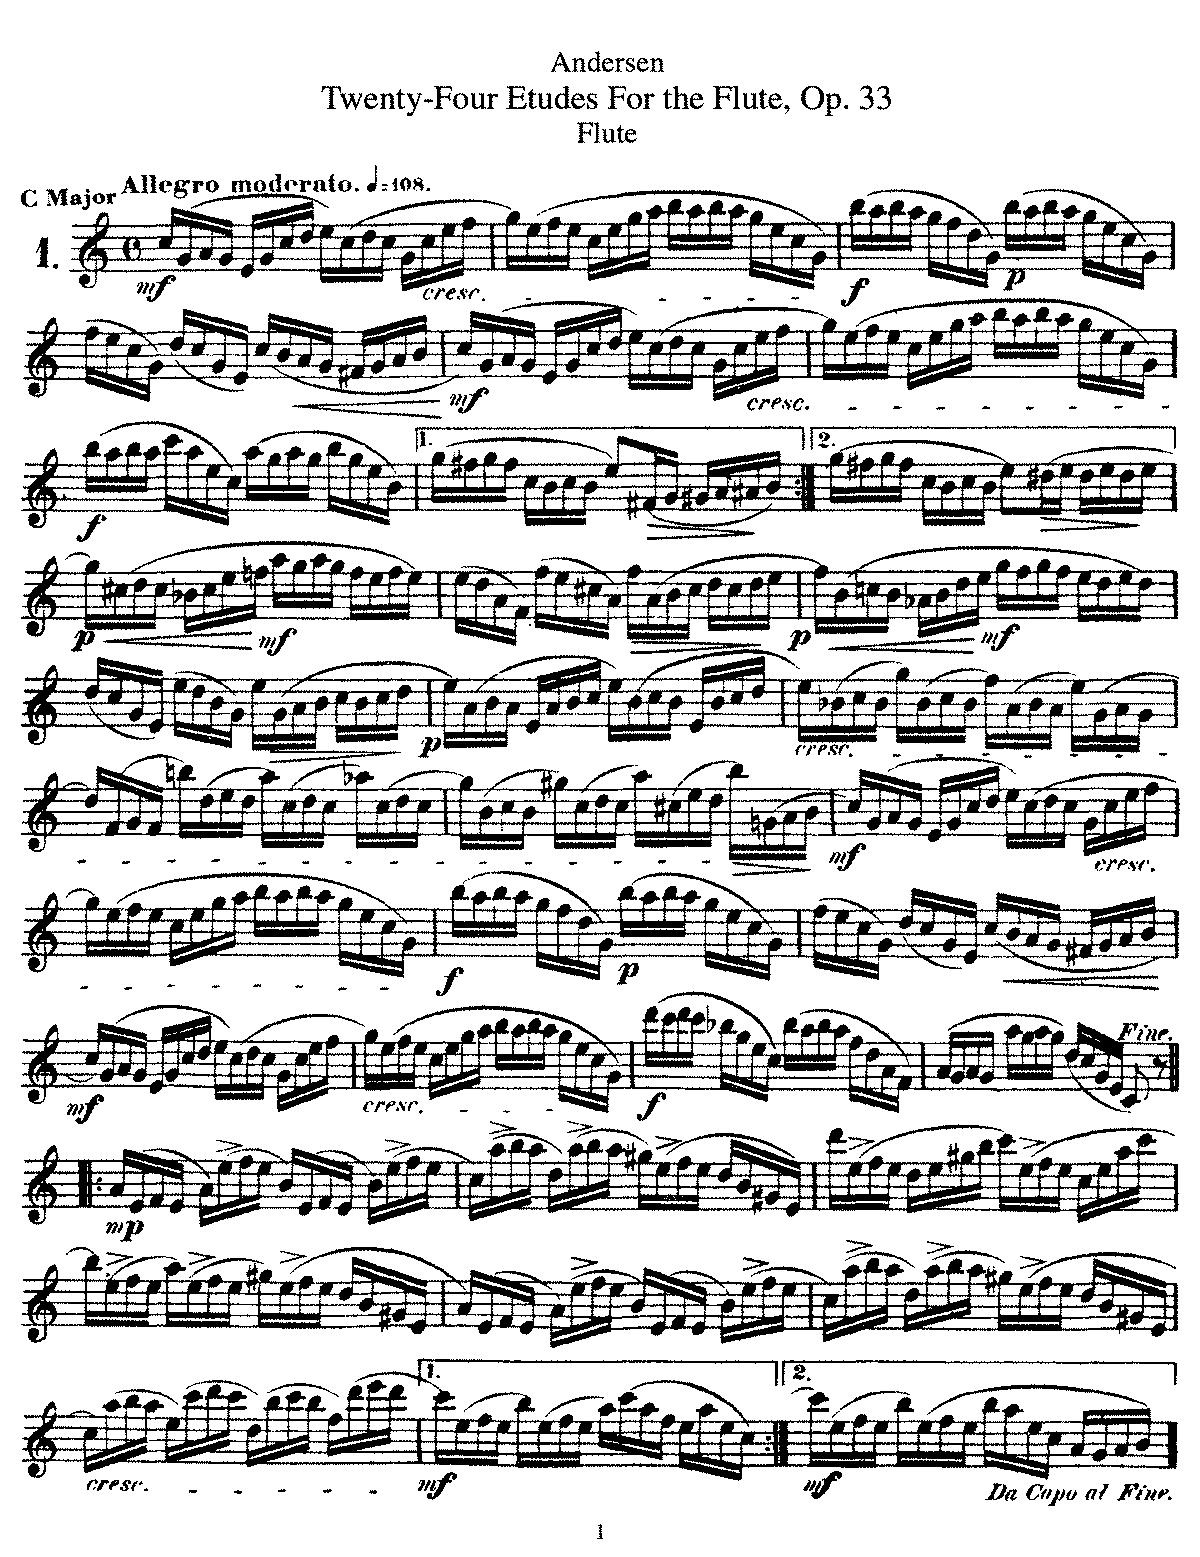 etude sheet music on steroids